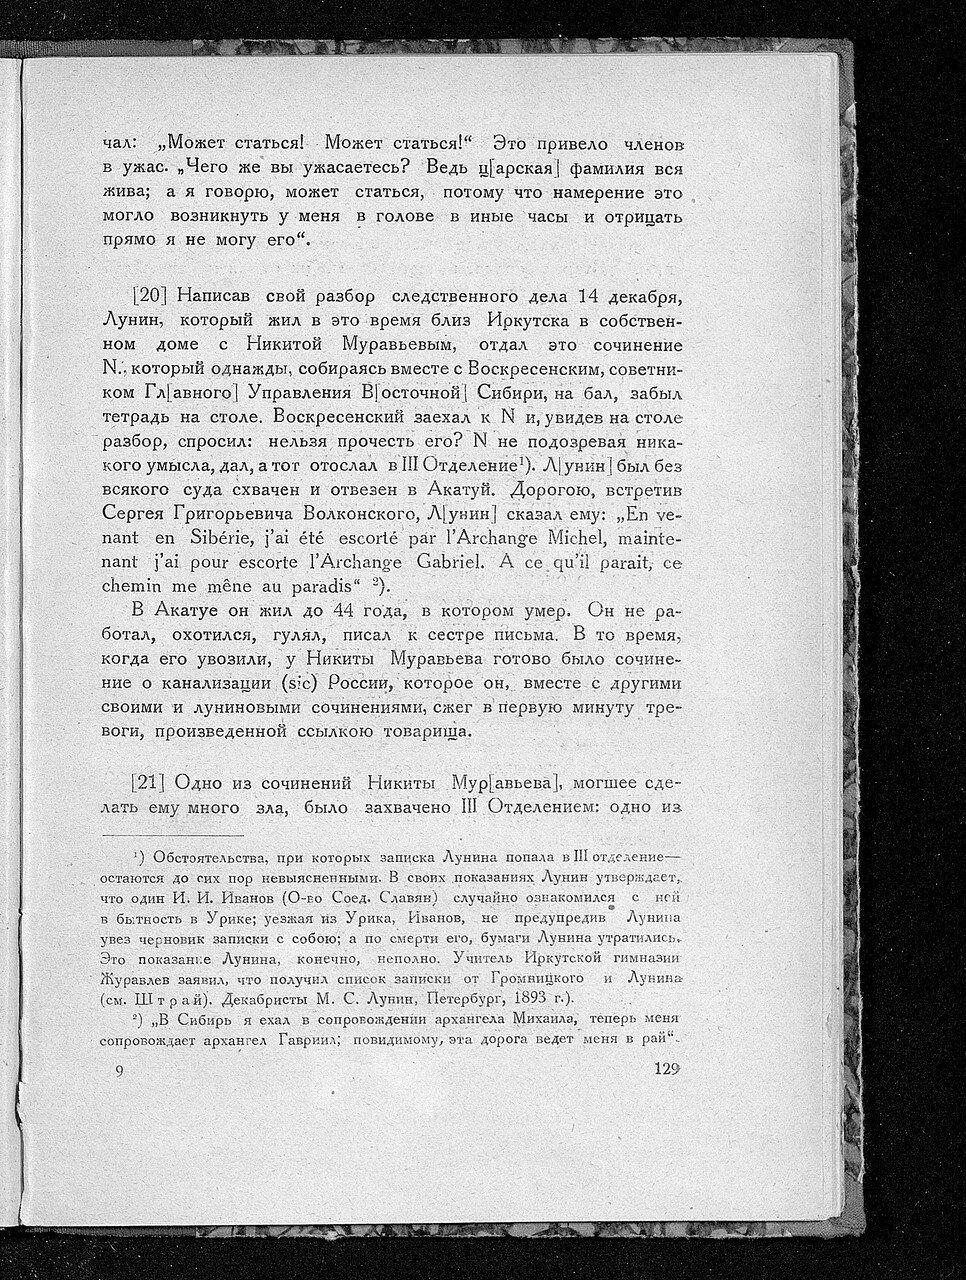 https://img-fotki.yandex.ru/get/875526/199368979.a2/0_21437b_11bb48f9_XXXL.jpg